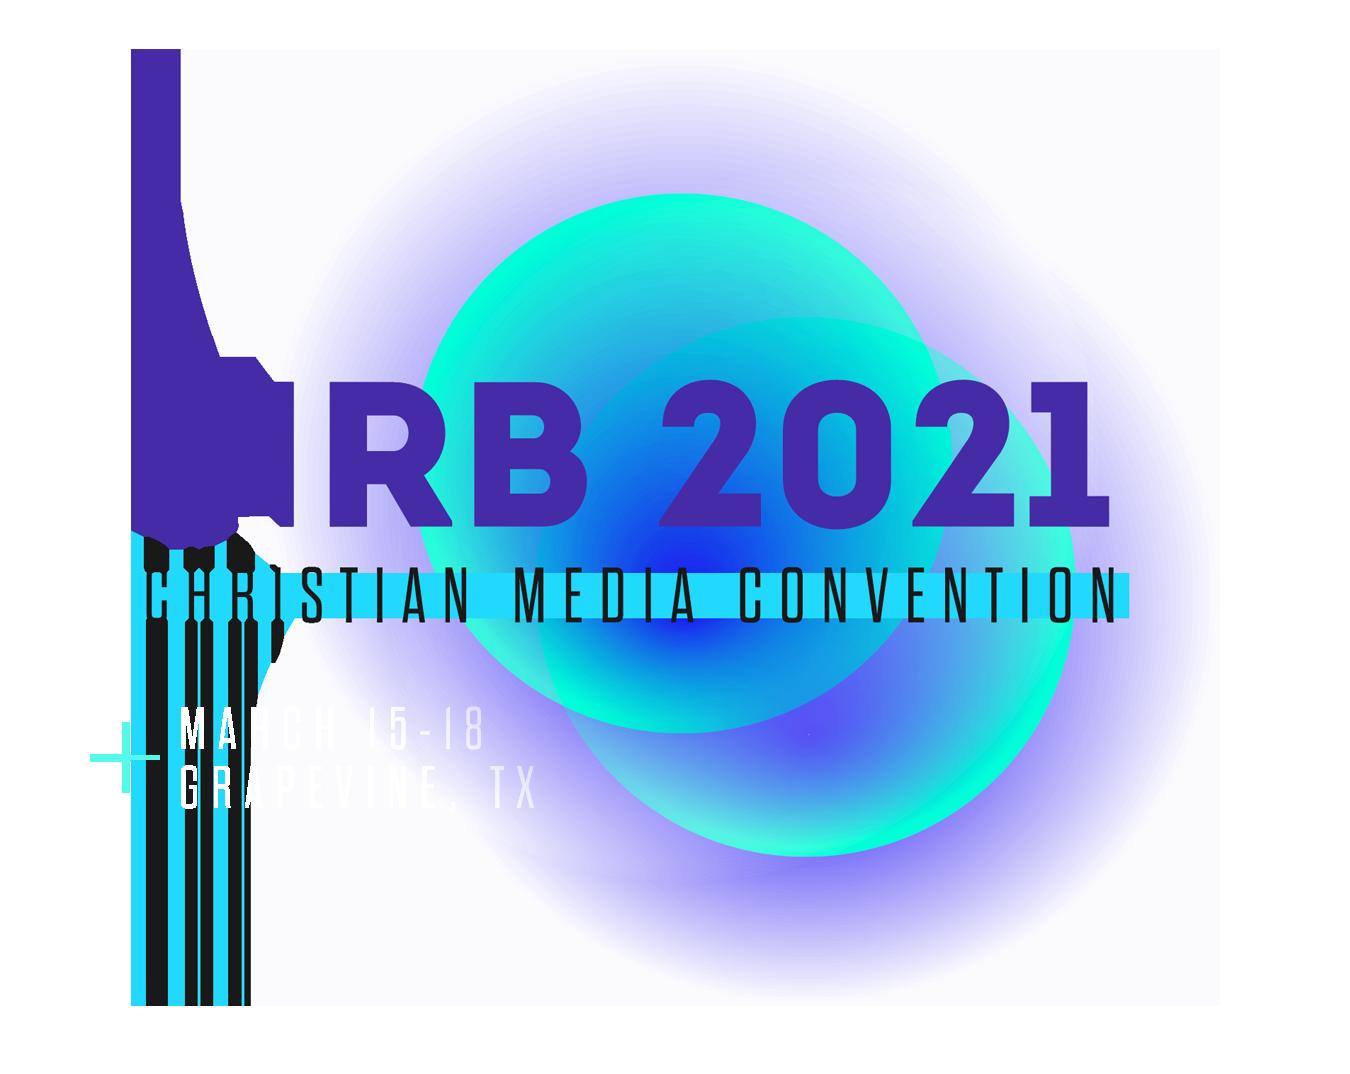 nrb2021-logo-temp-winfo2